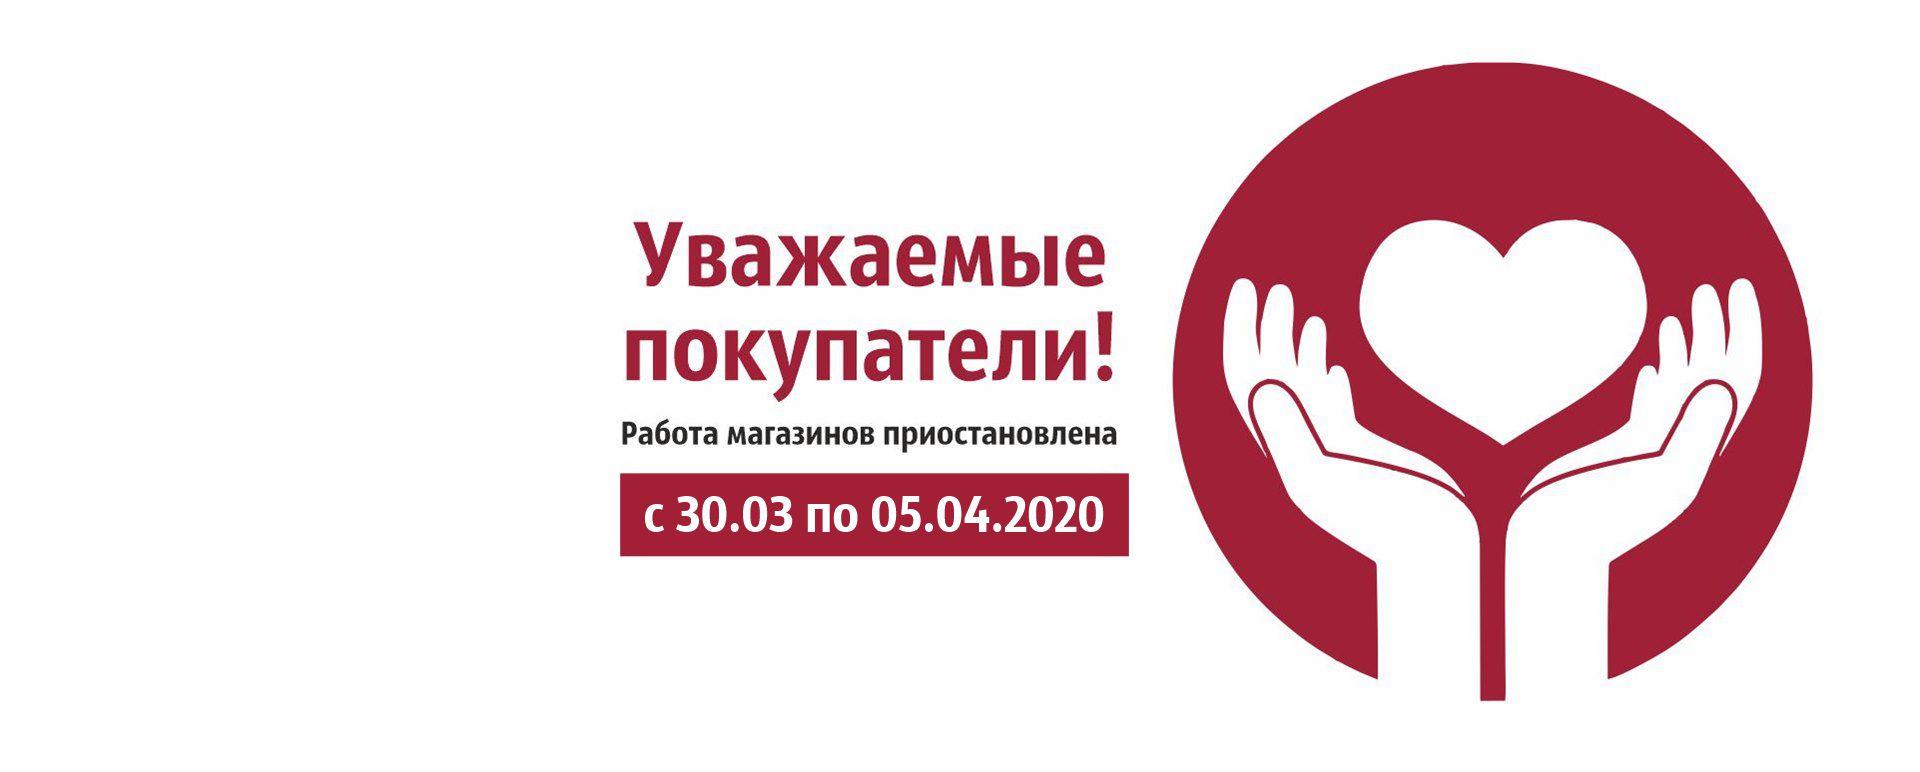 https://www.almazcom.ru/pub/img/Info/24/banner_almaz_karantin.jpg